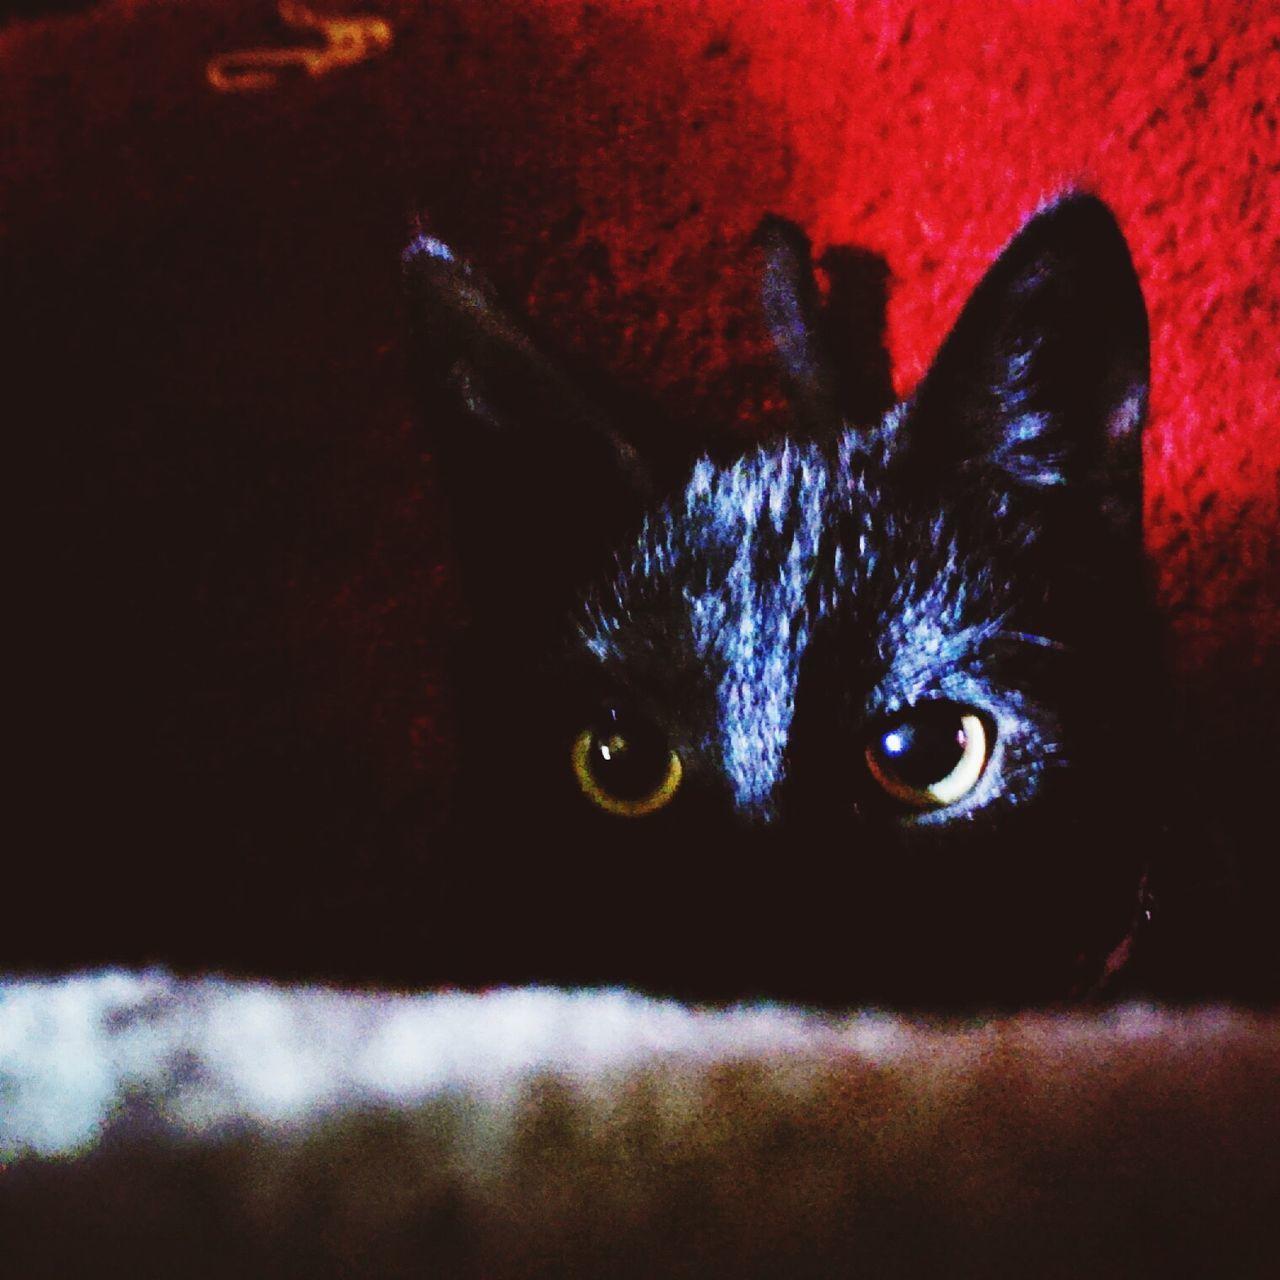 Showcase June Kitty Cat Polydactal Eyes Attackmode